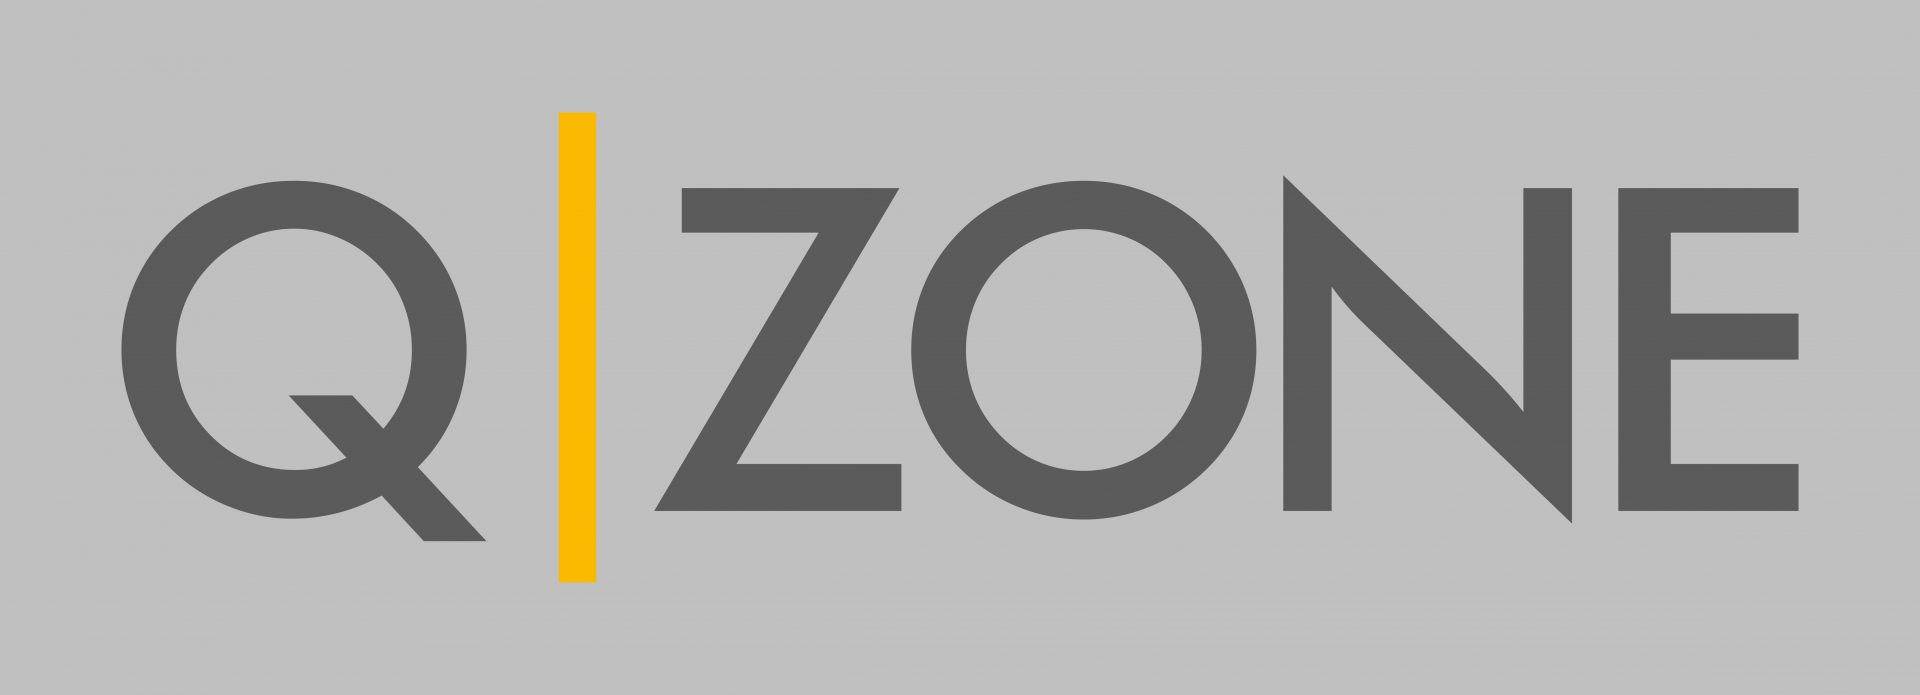 Q-ZONE logo